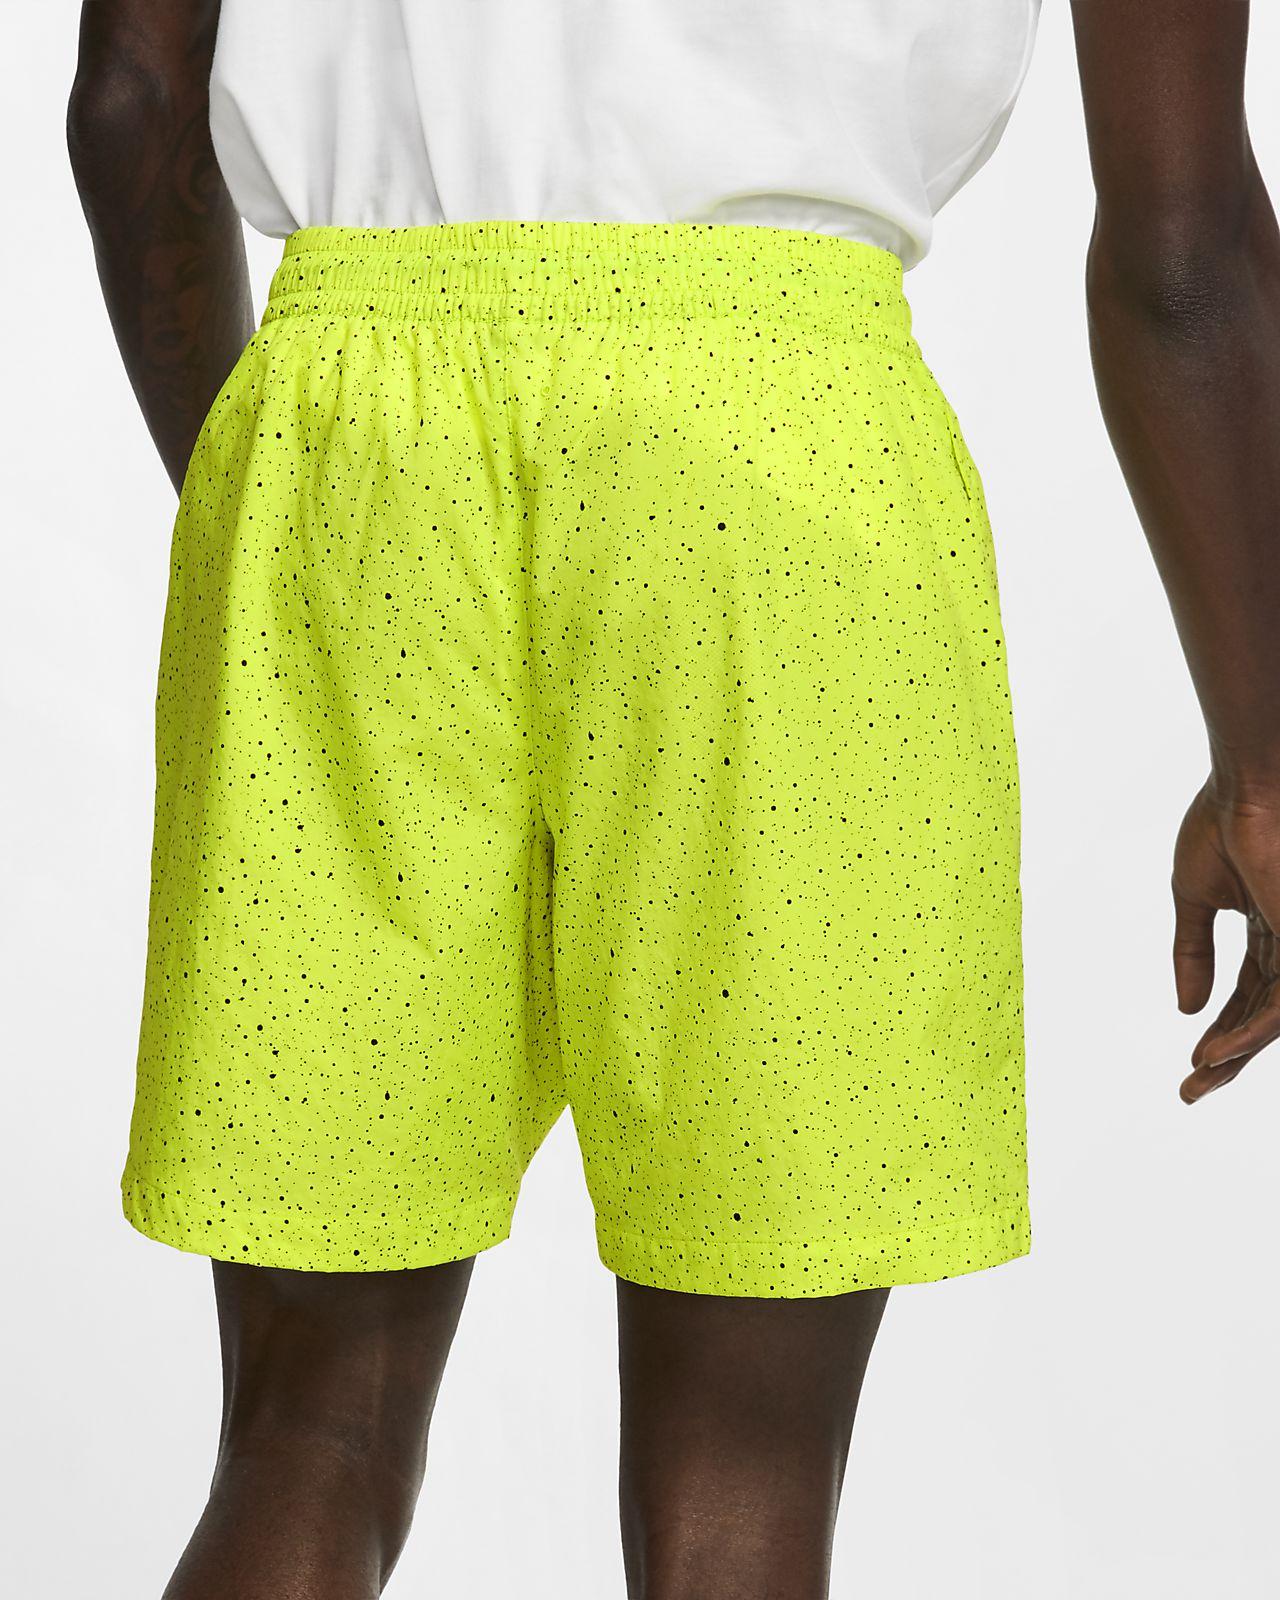 c78f22914af Jordan Jumpman Cement Poolside Men's 18cm approx. Shorts. Nike.com BE